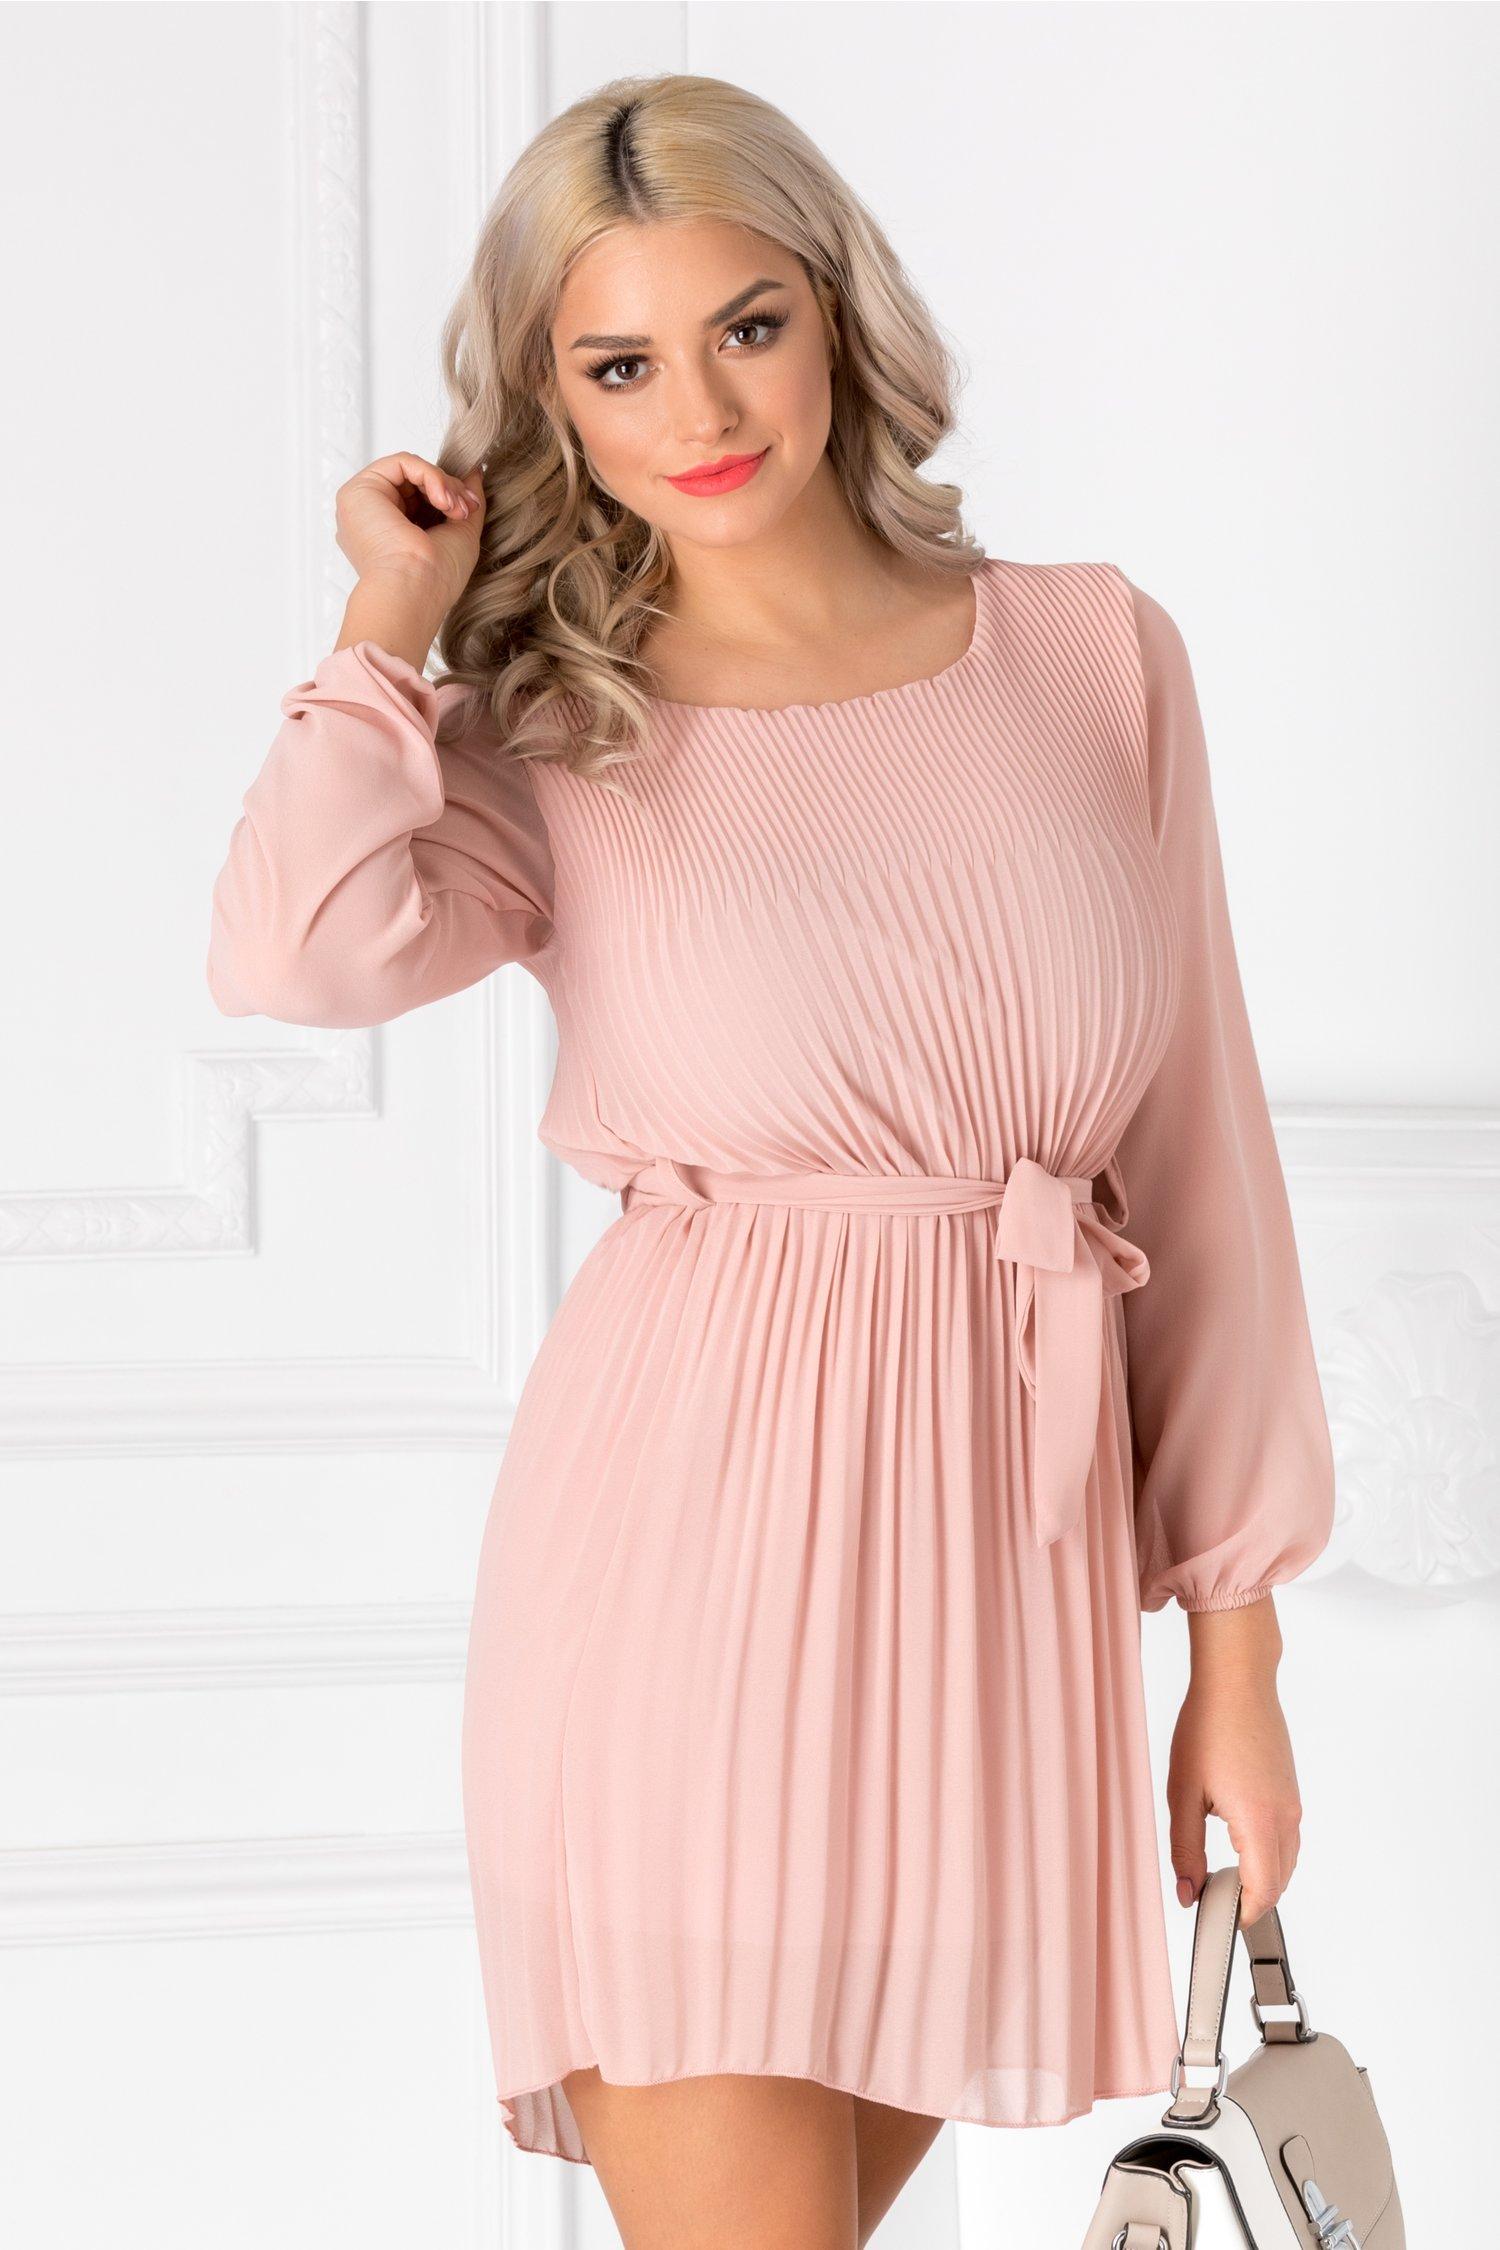 Rochie Alma roz prafuit usor plisata cu cordon in talie